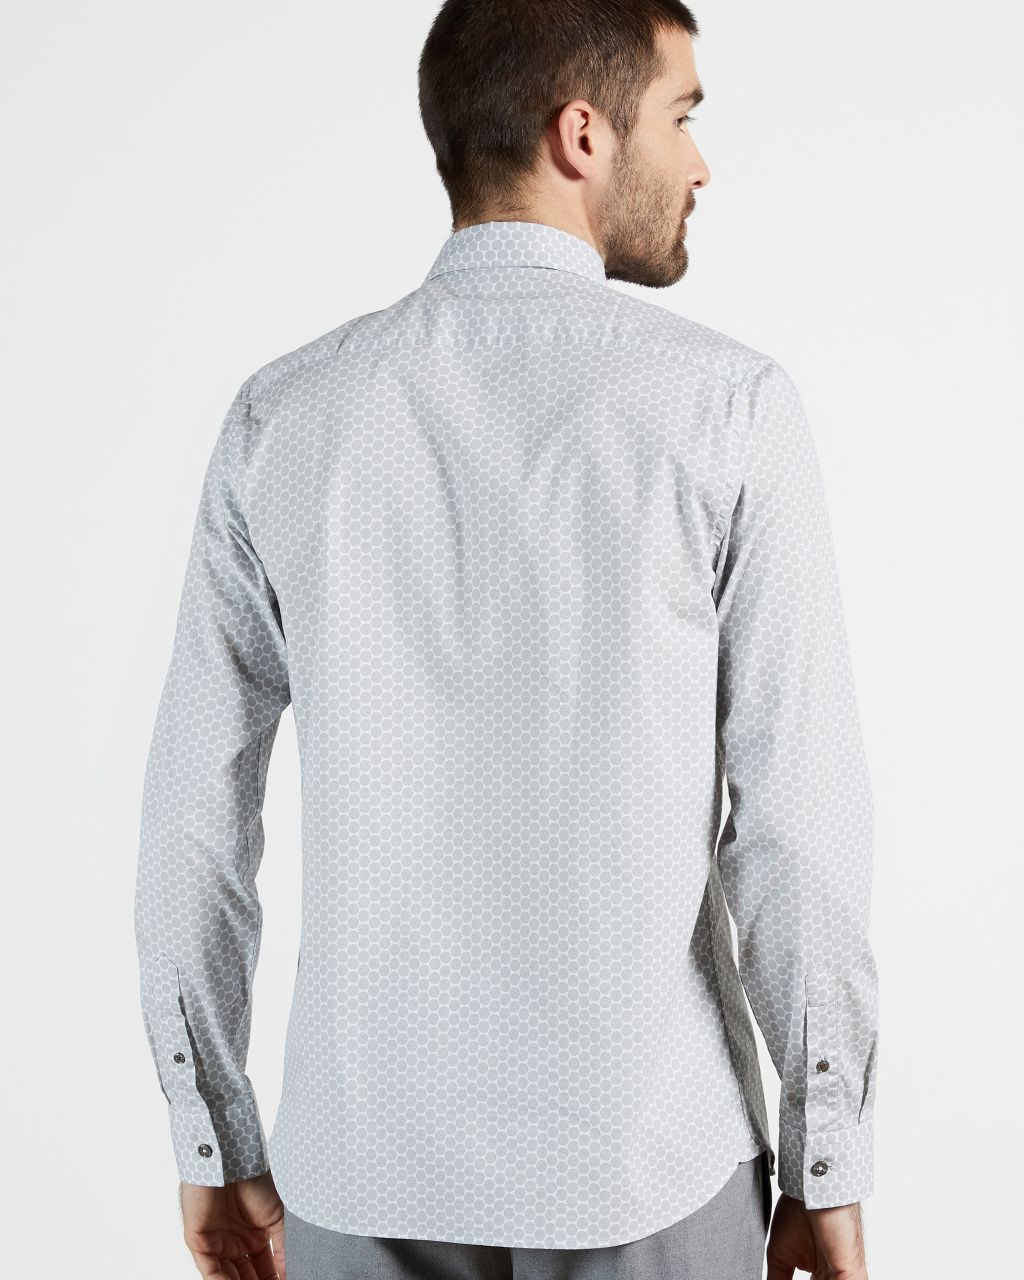 Spot Geometric Print Shirt